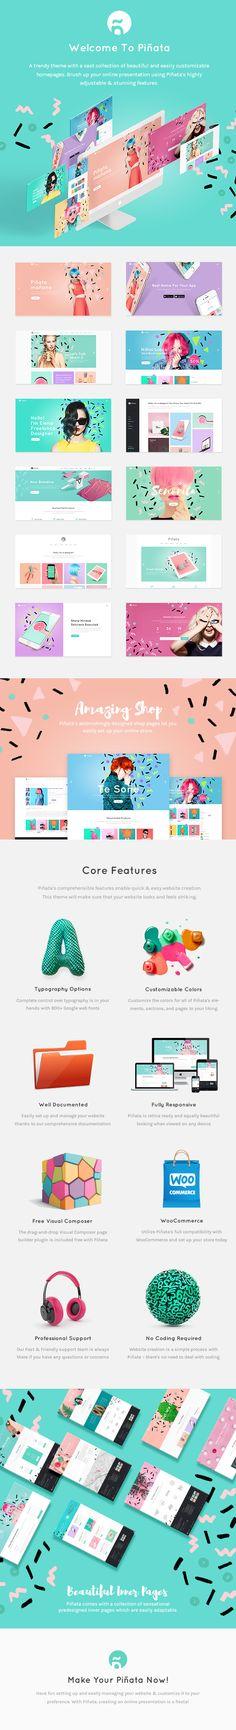 Piñata - A Fun, Vibrant Theme for Creative Agencies & Freelancers #creative #design #freelance • Download ➝ https://themeforest.net/item/piata-a-fun-vibrant-theme-for-creative-agencies-freelancers/19082679?ref=pxcr